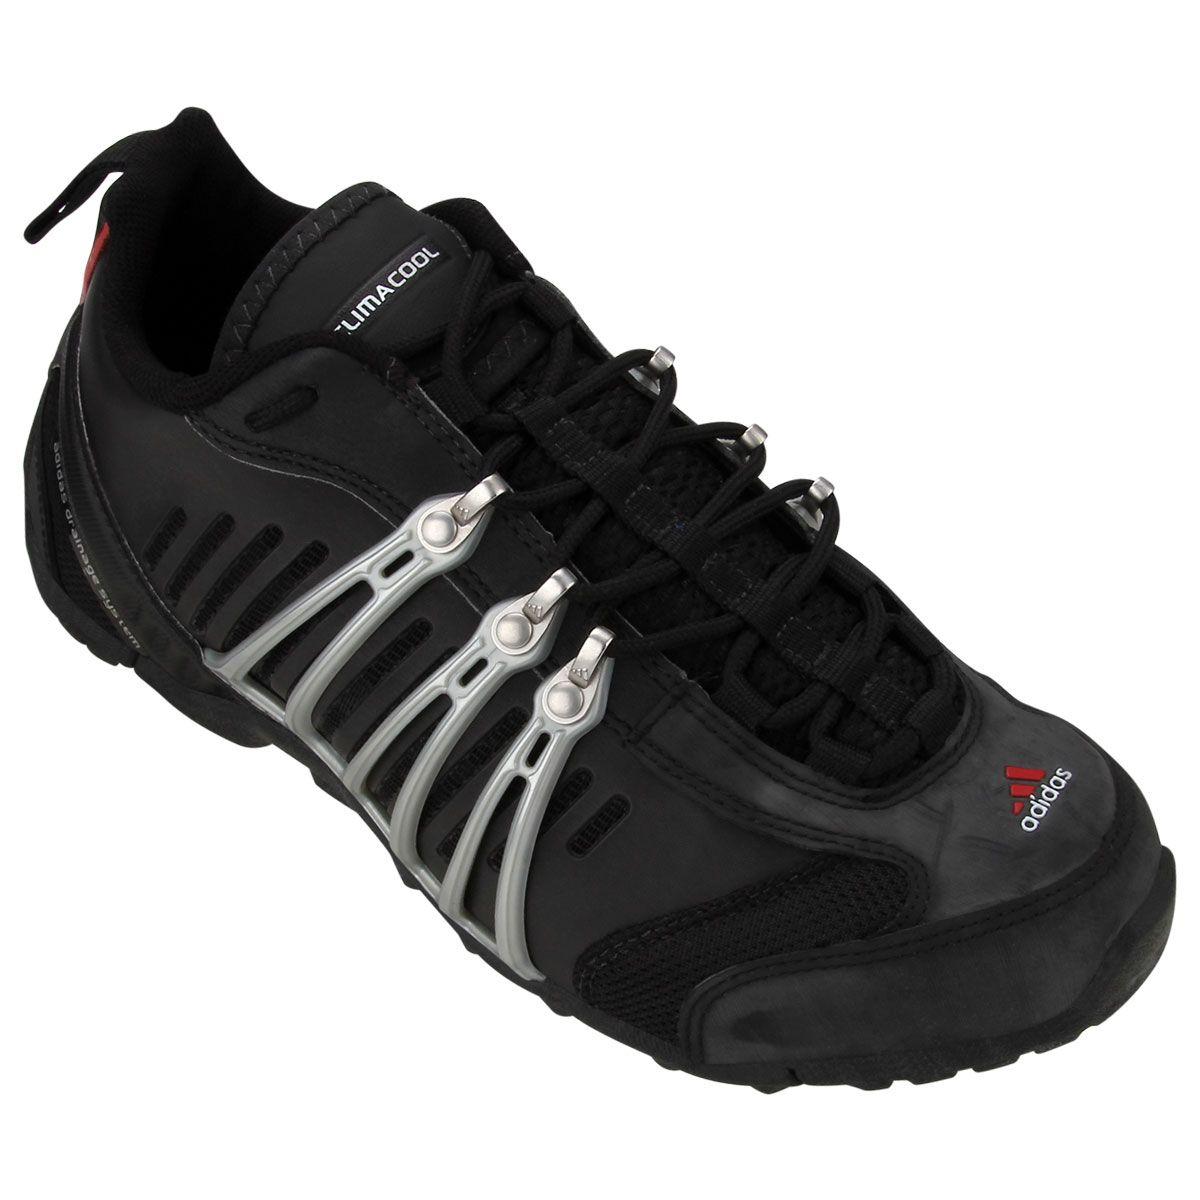 Netshoes tenis adidas CC Hellbender zapatos Chaman Pinterest